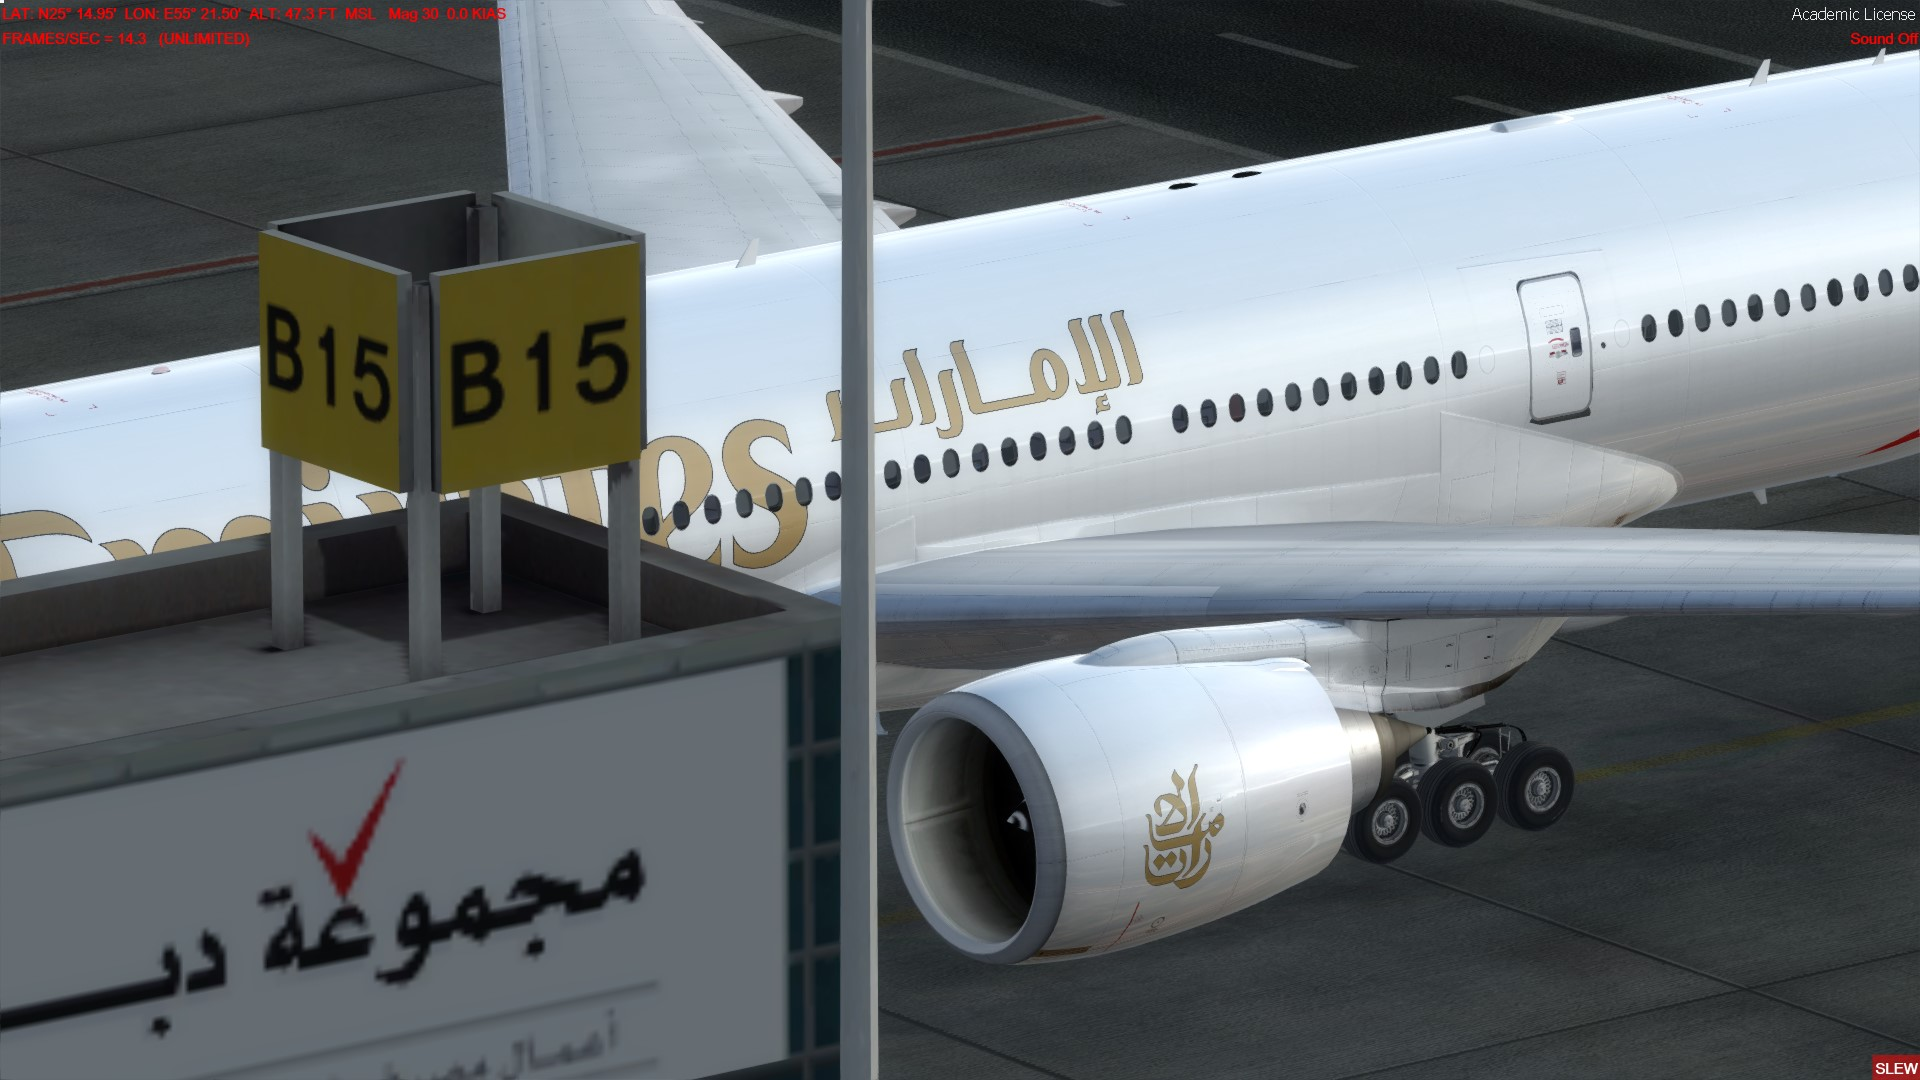 B77L at Gate B15